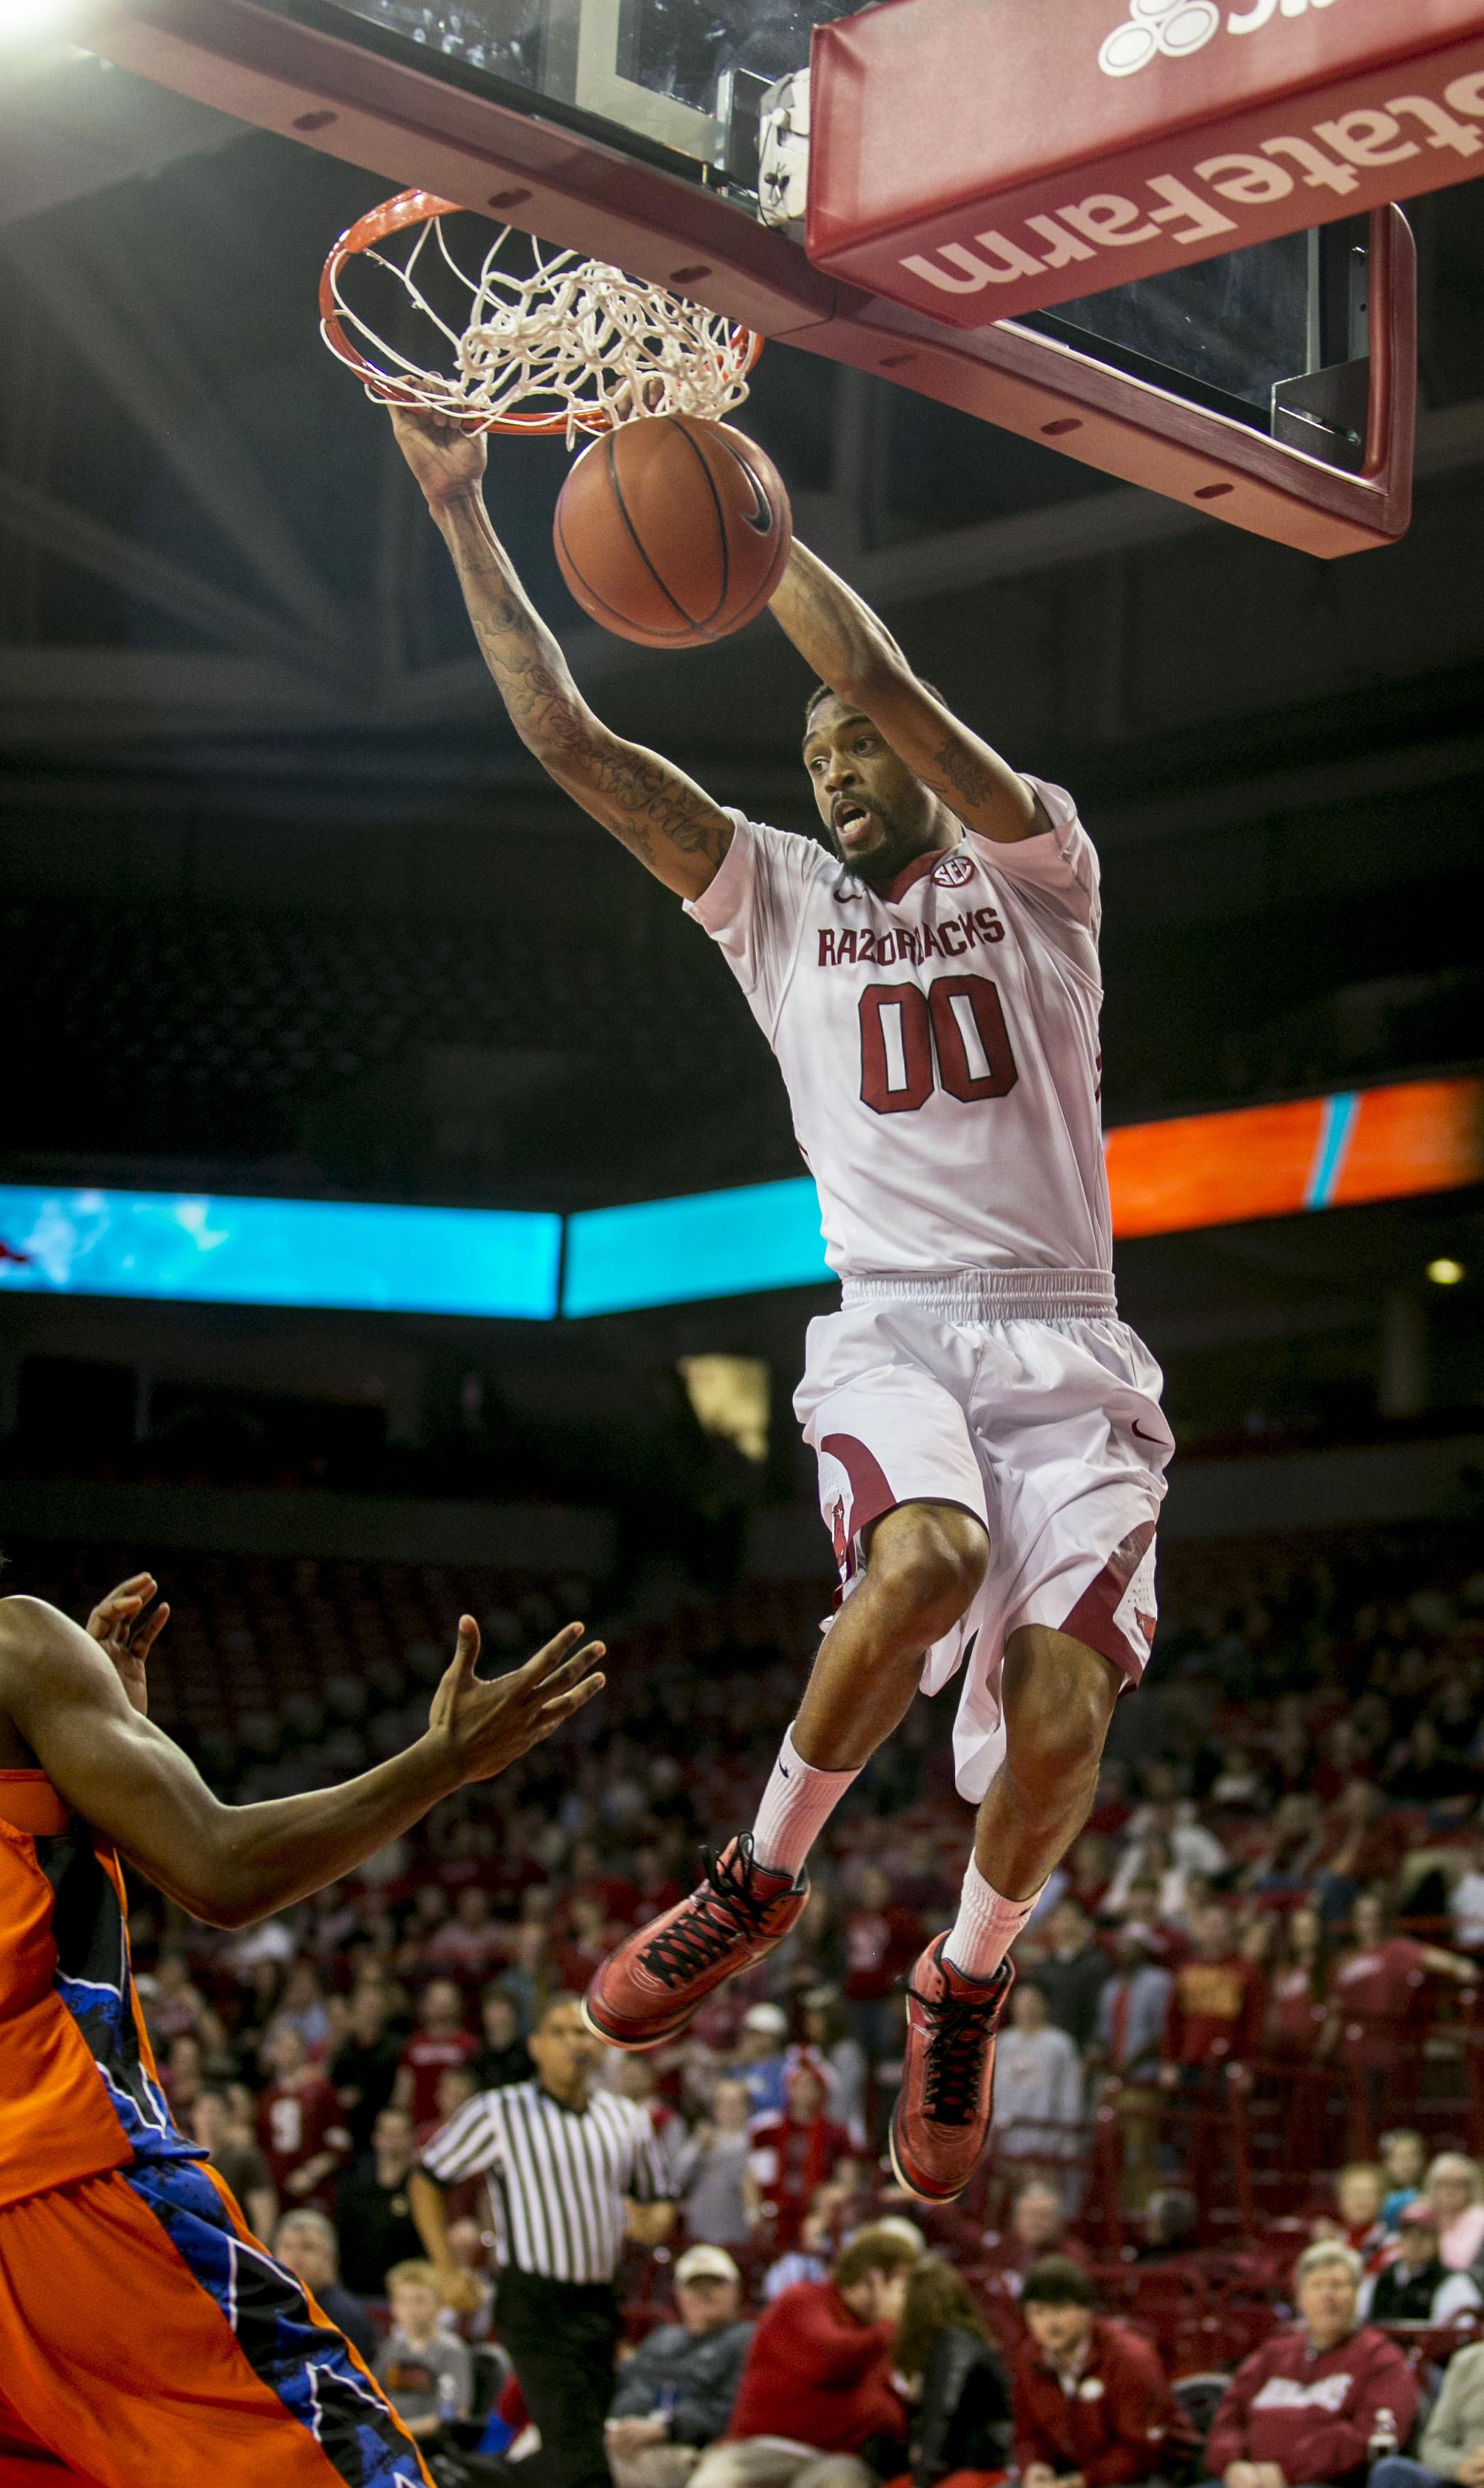 Madden's career high lifts Arkansas in 2nd half